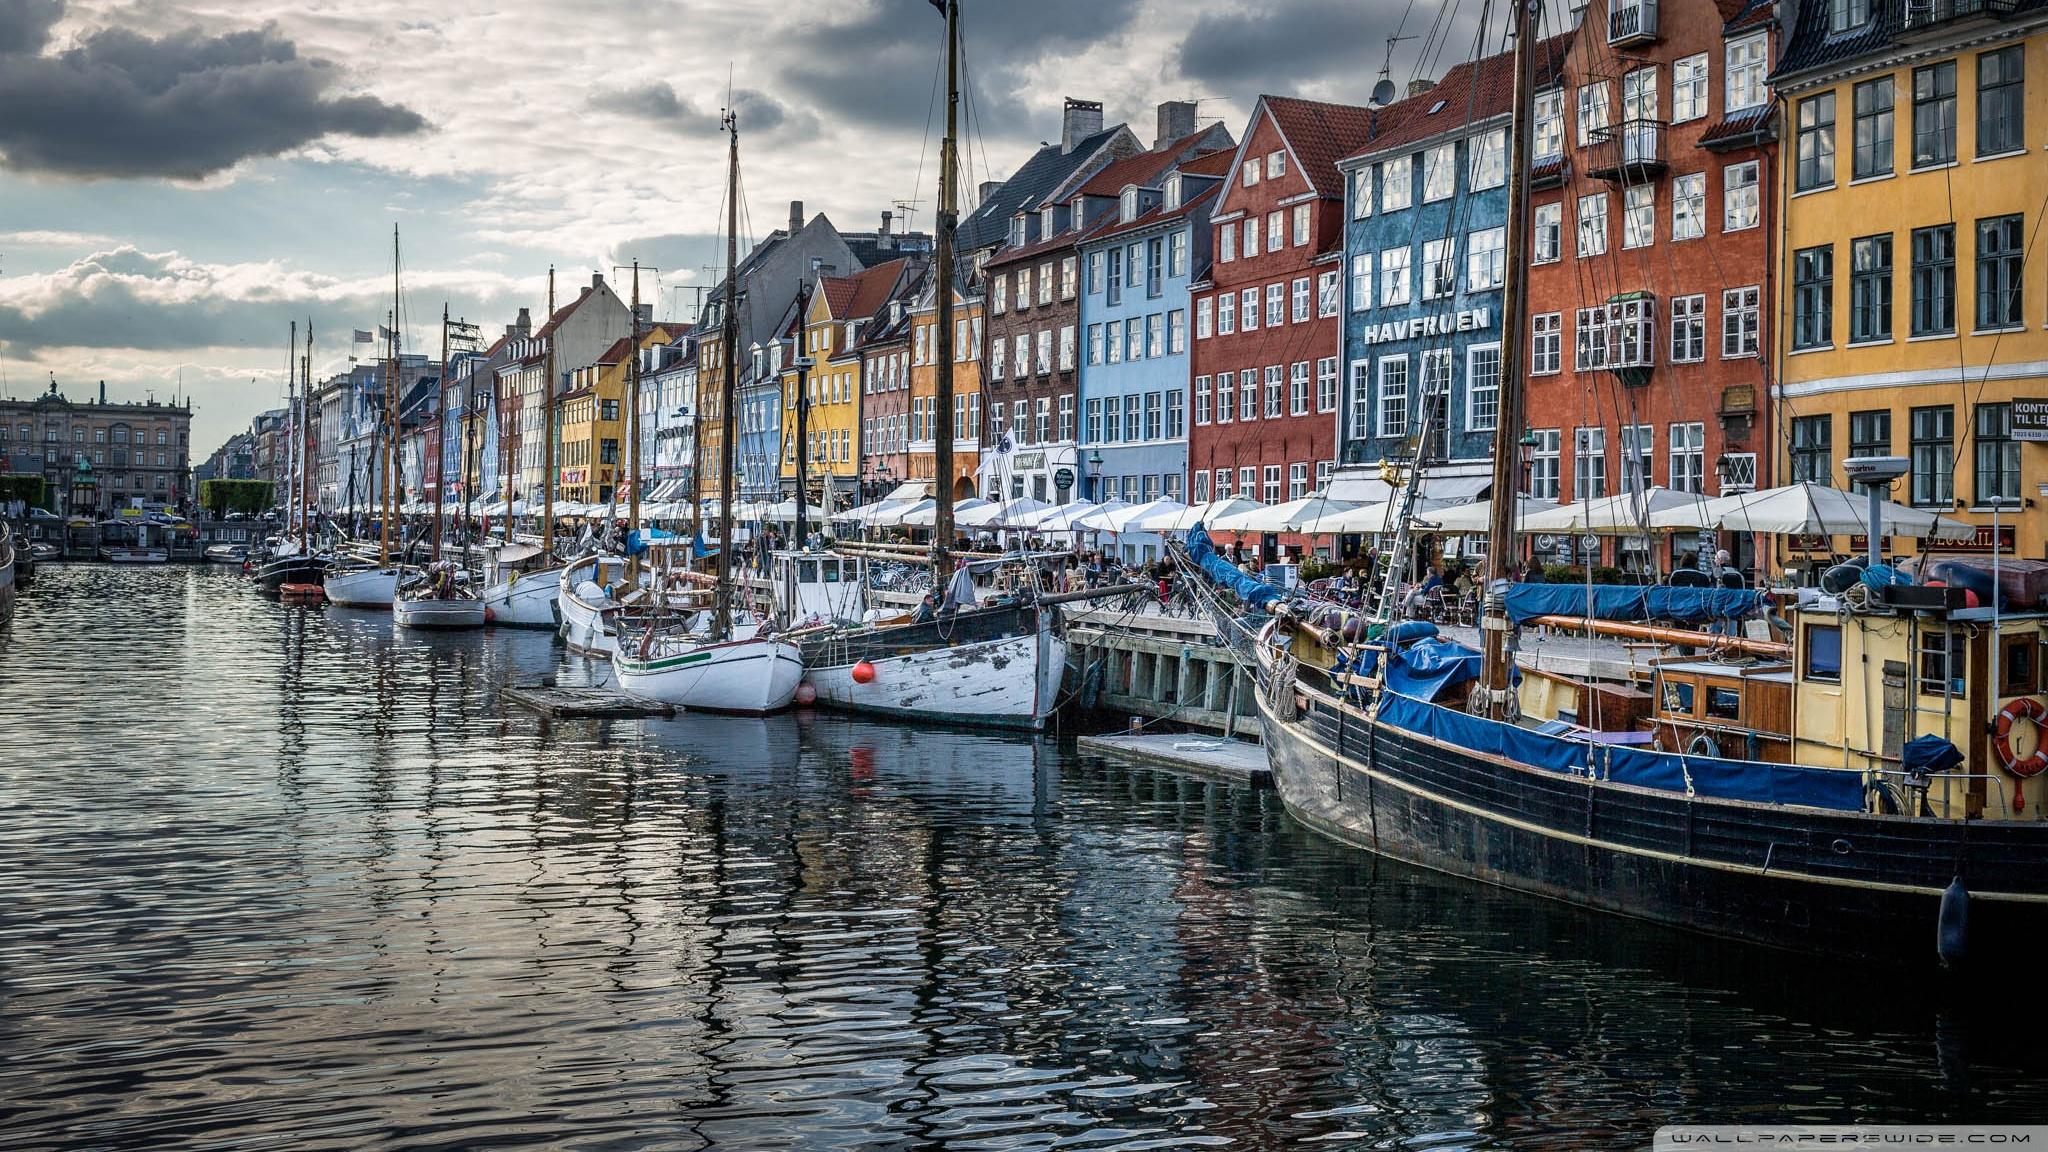 Copenhagen Denmark 4K HD Desktop Wallpaper for 4K Ultra HD TV 2048x1152